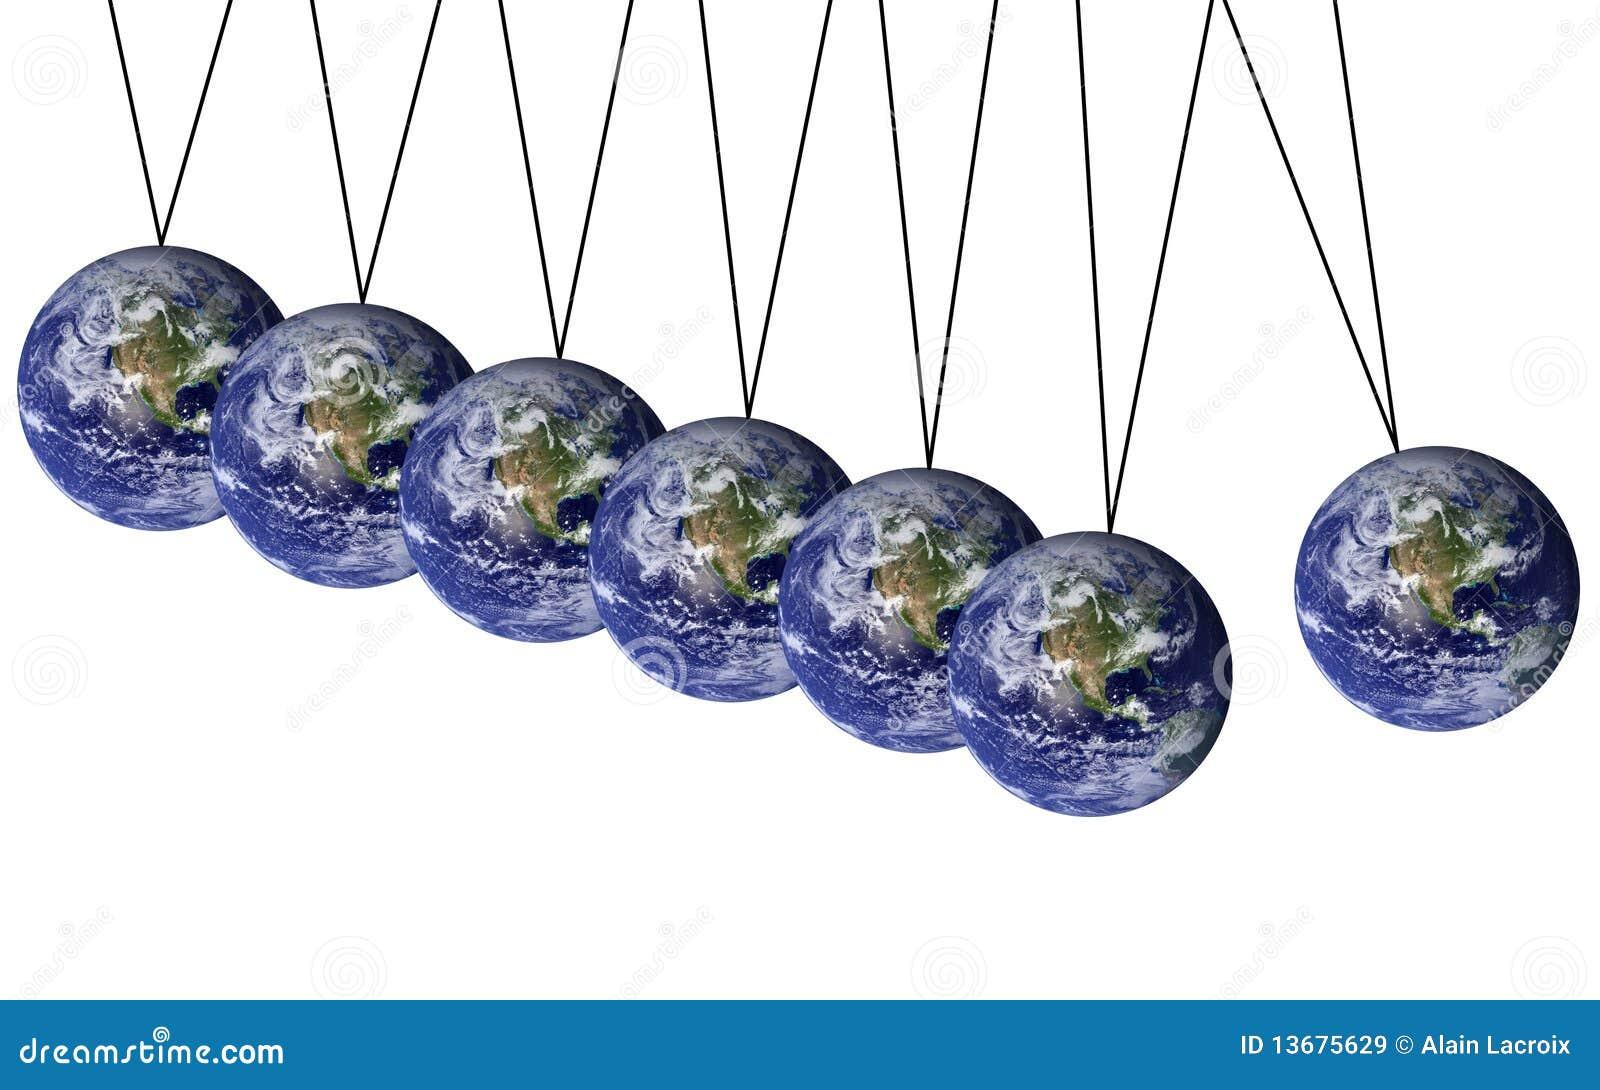 Earth pendulum stock illustration  Illustration of danger - 13675629